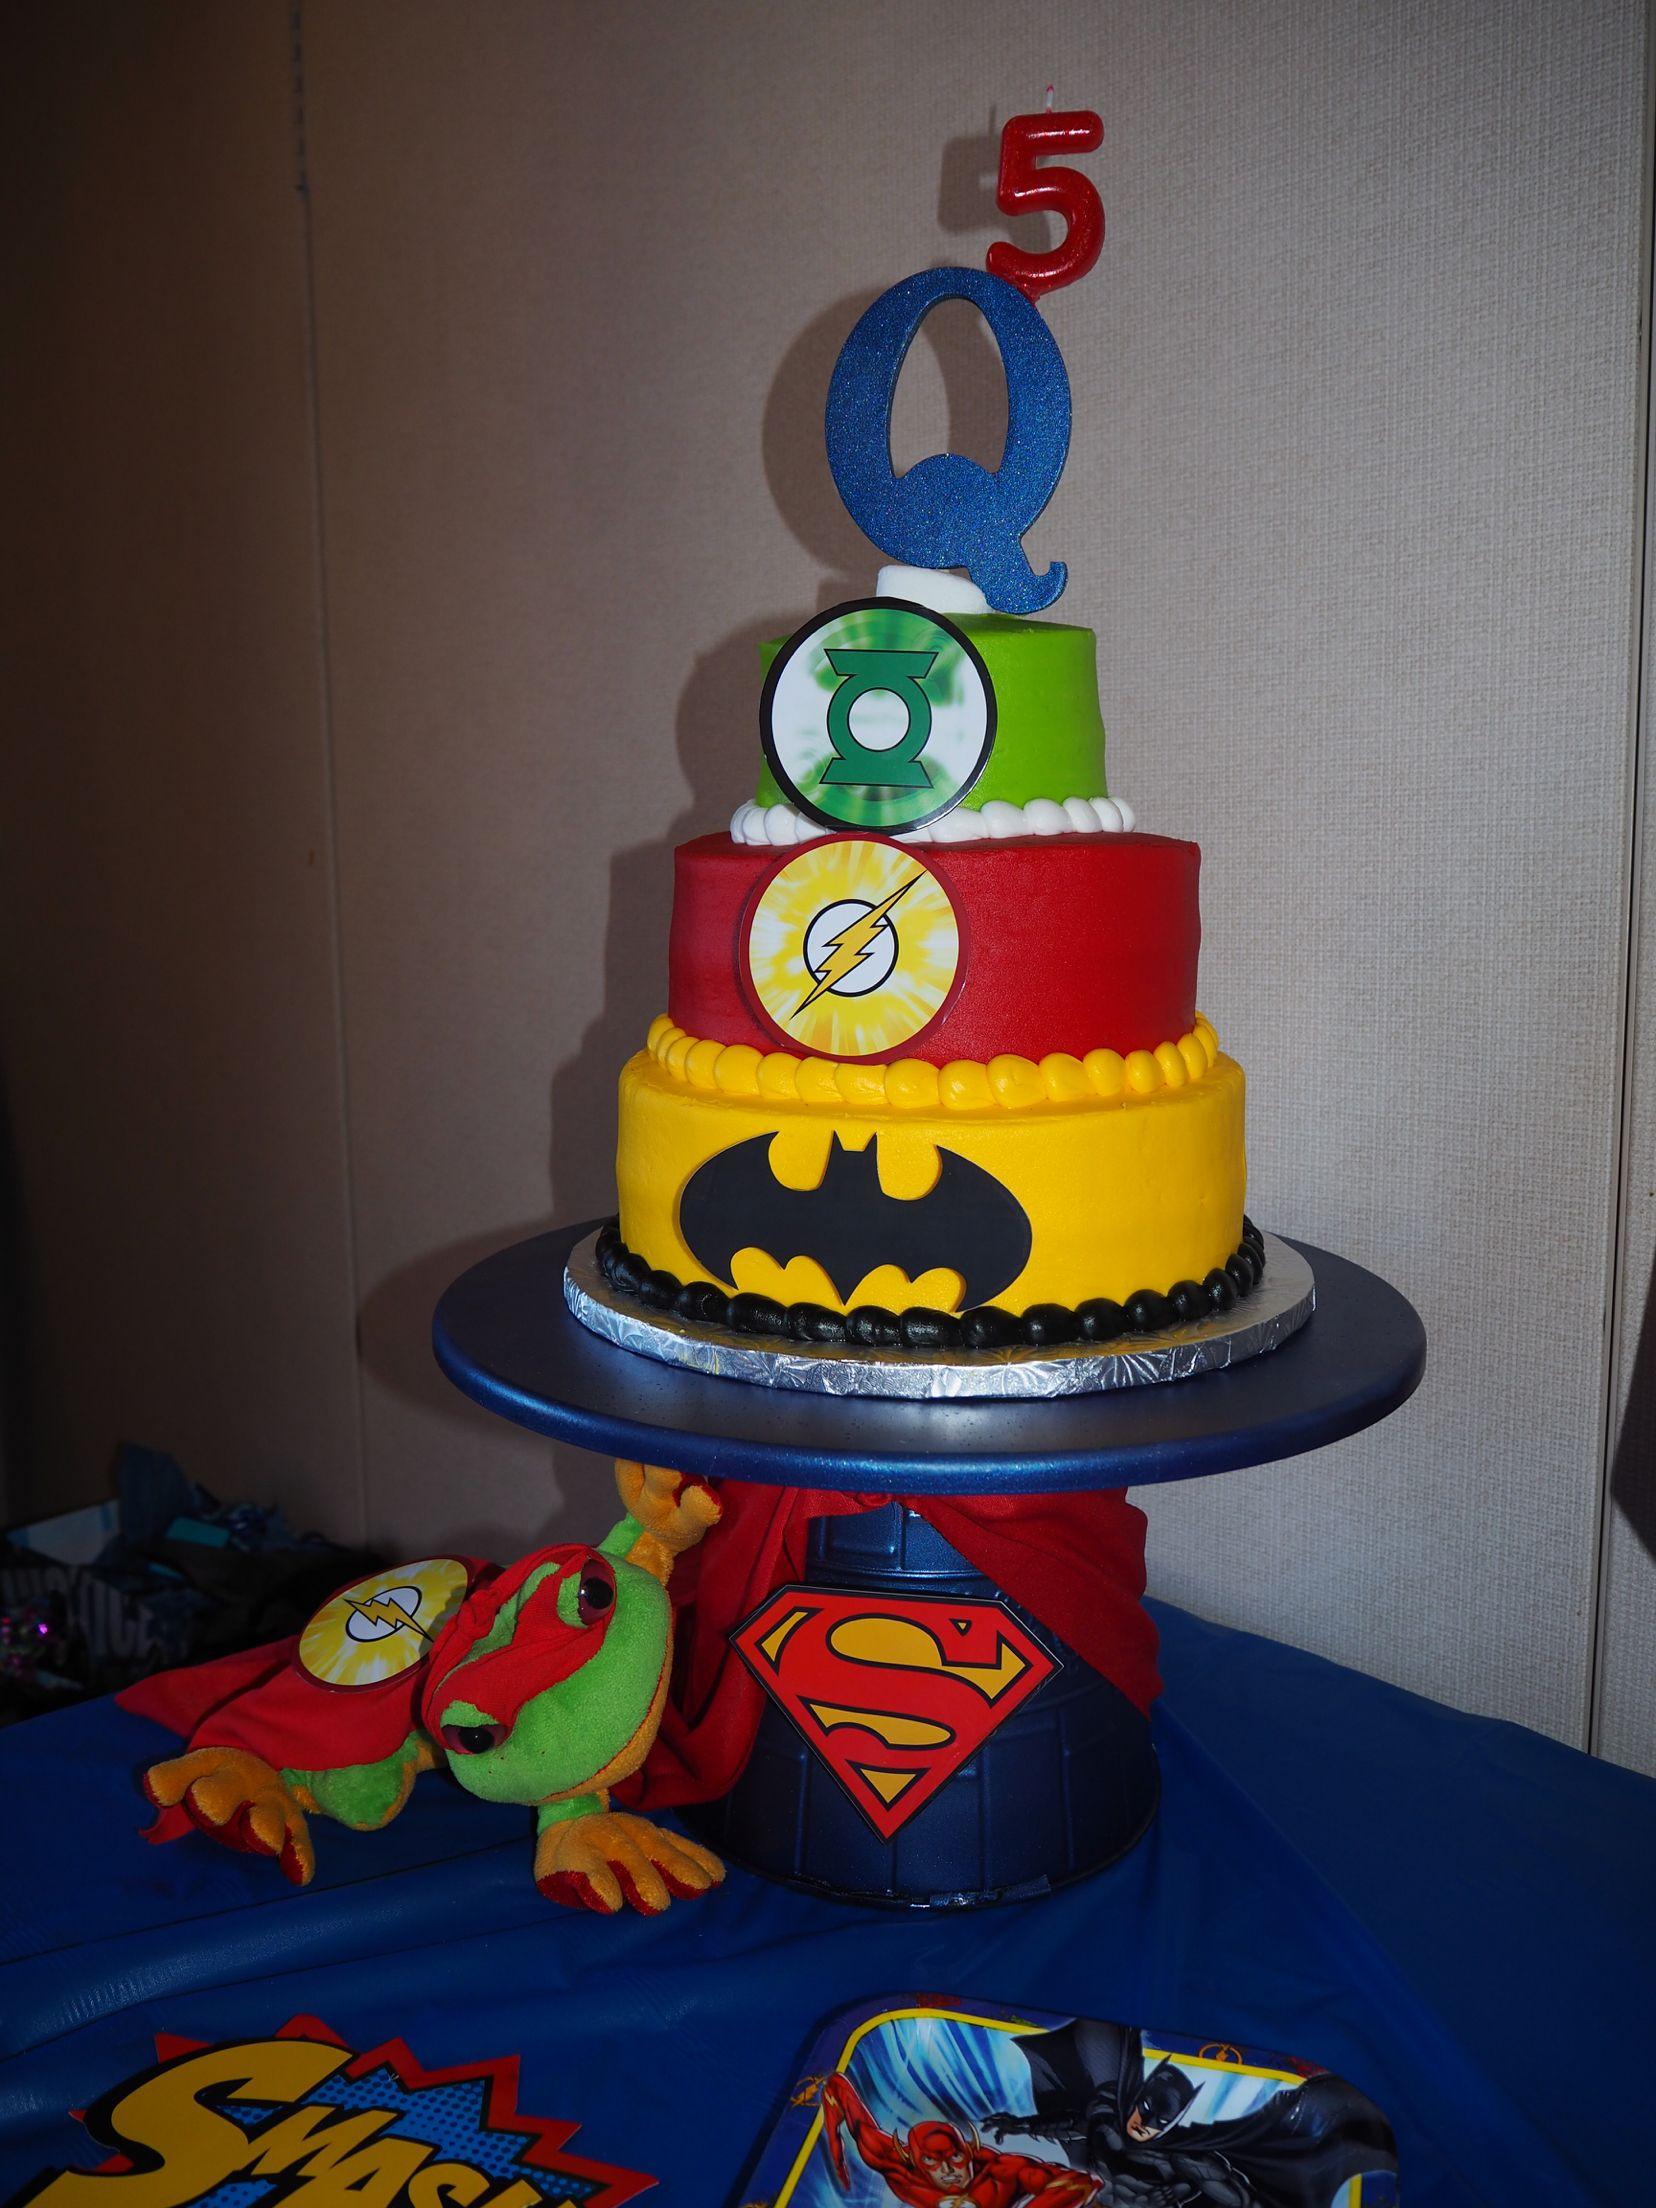 Justice league birthday cake. Superman cake stand! | Birthday ...